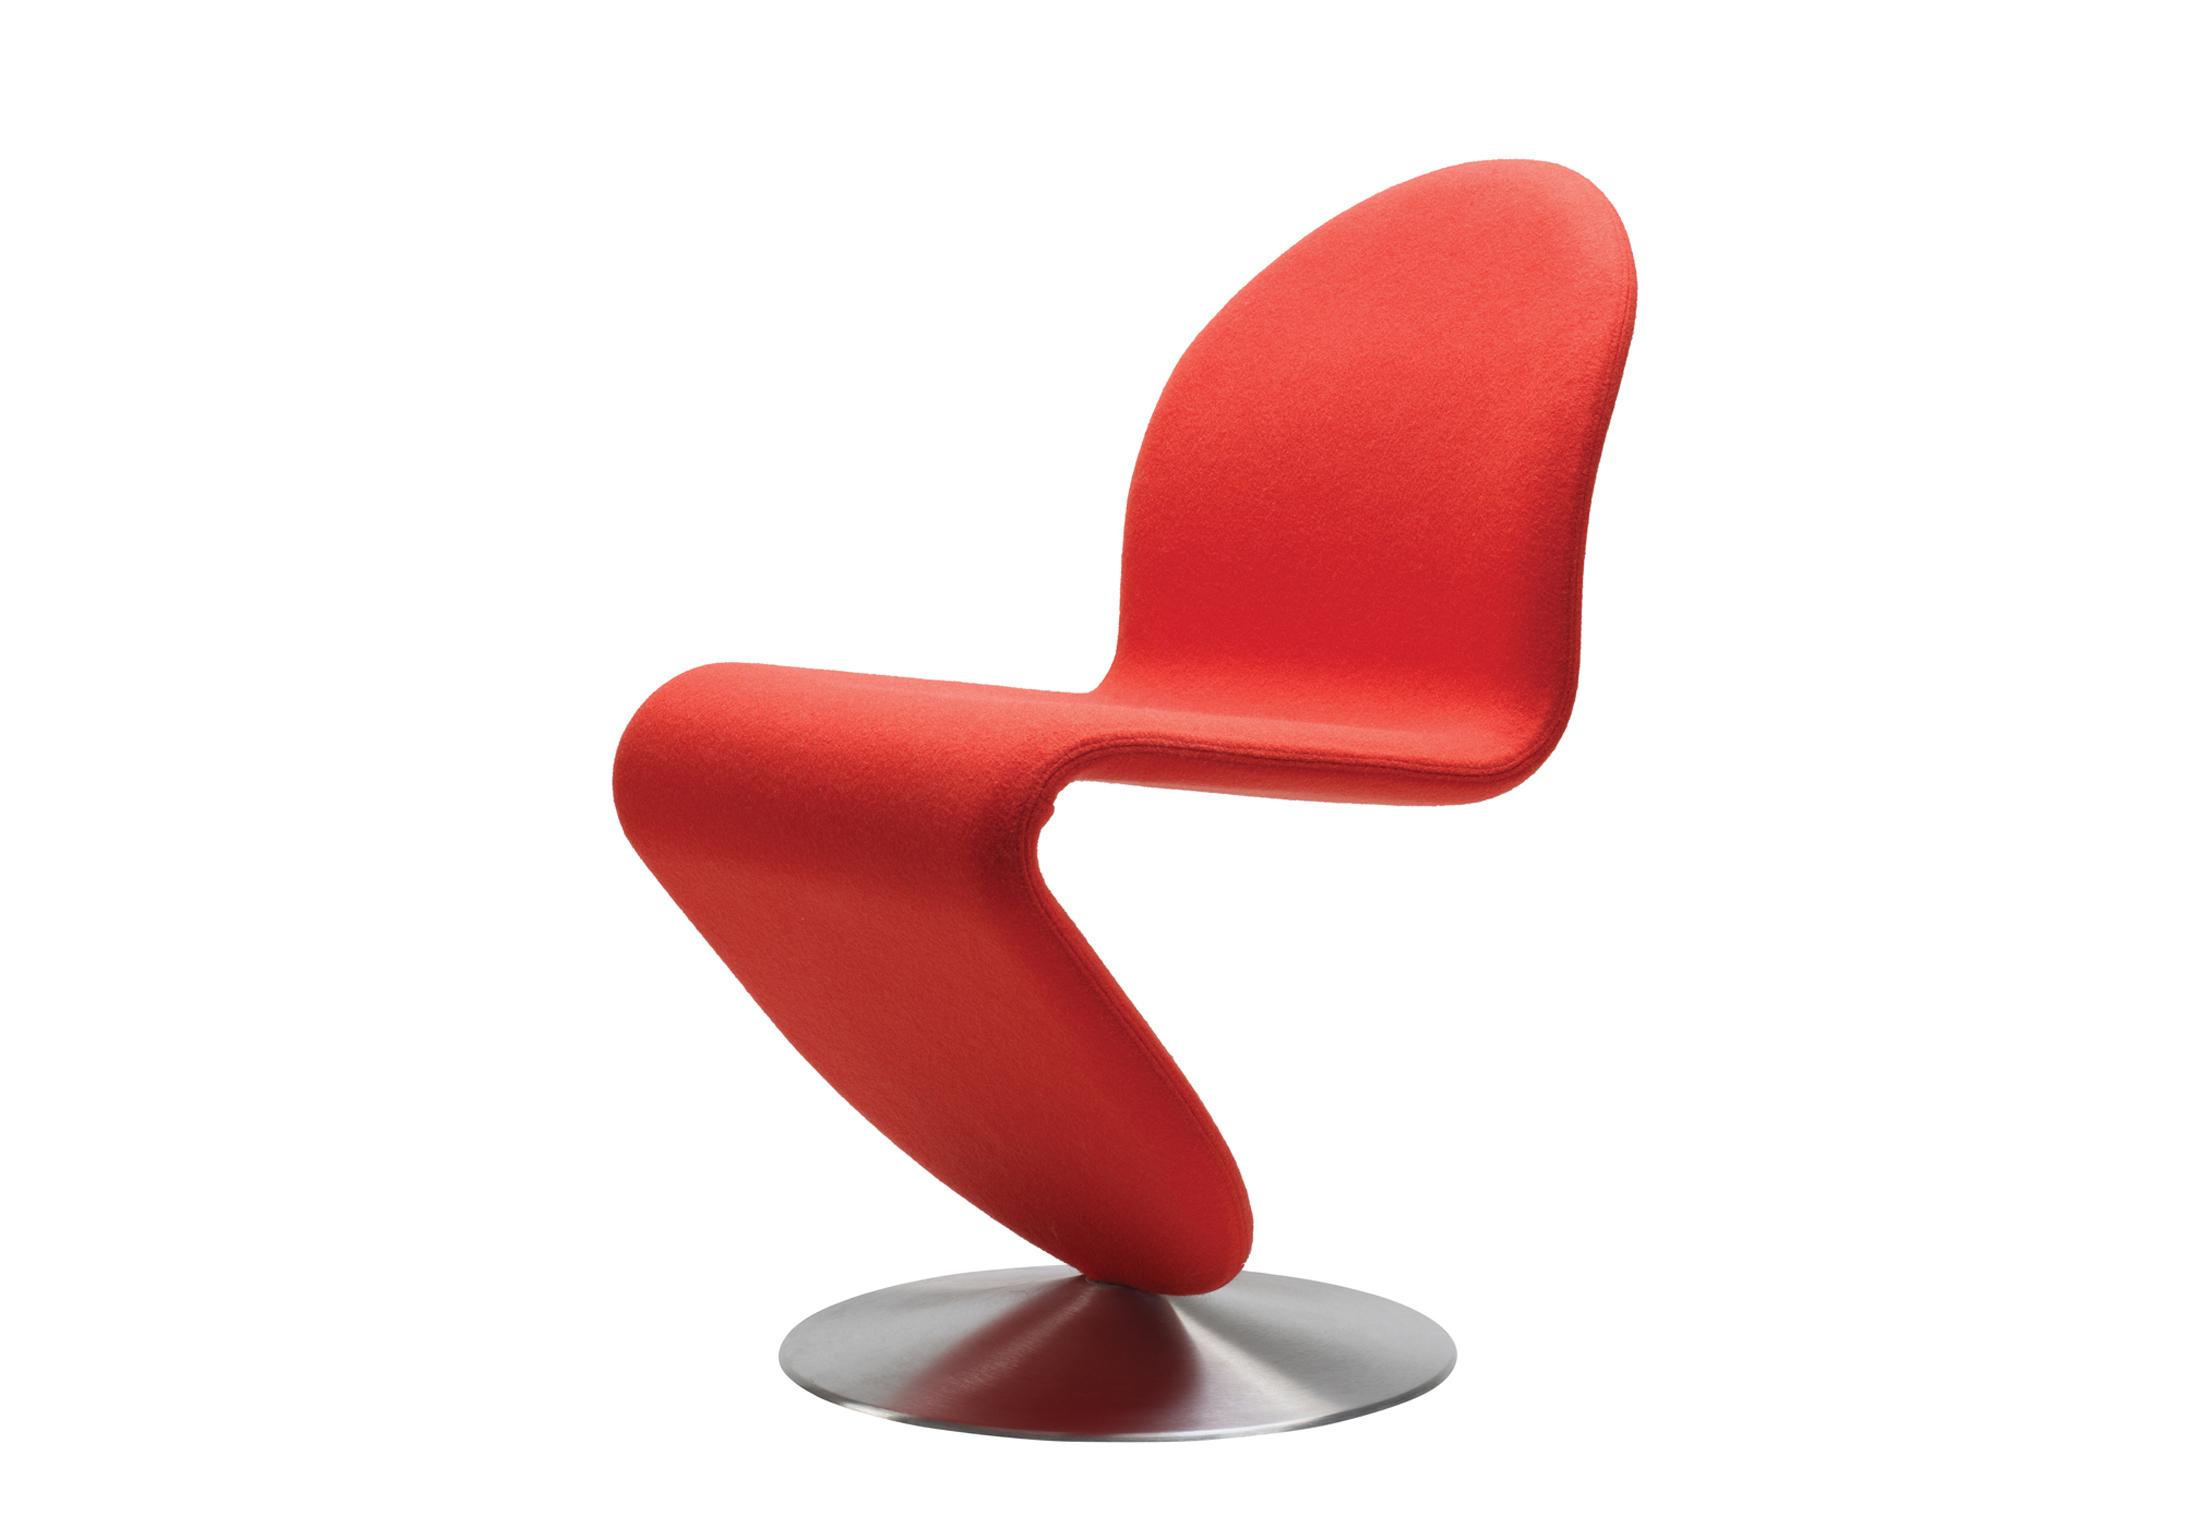 dining chair standard 1 2 3 von verpan stylepark. Black Bedroom Furniture Sets. Home Design Ideas